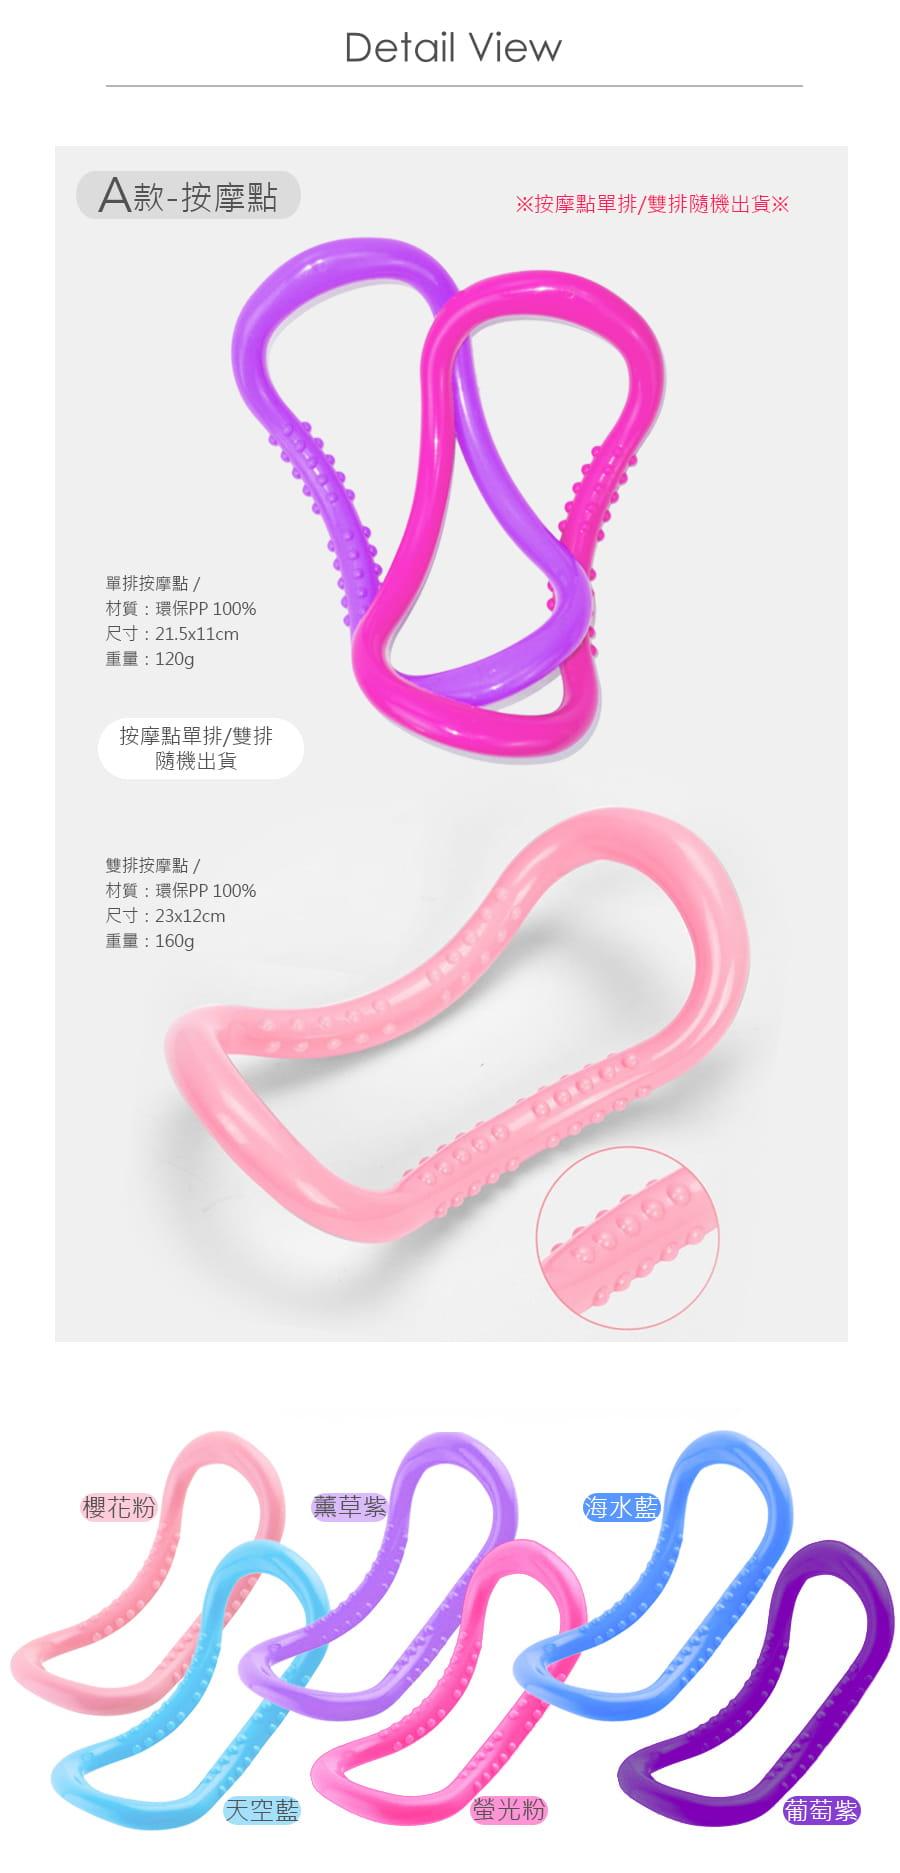 【Un-Sport高機能】Fitness Kit女力健身超值套組(8字拉力帶+瑜珈環) 14